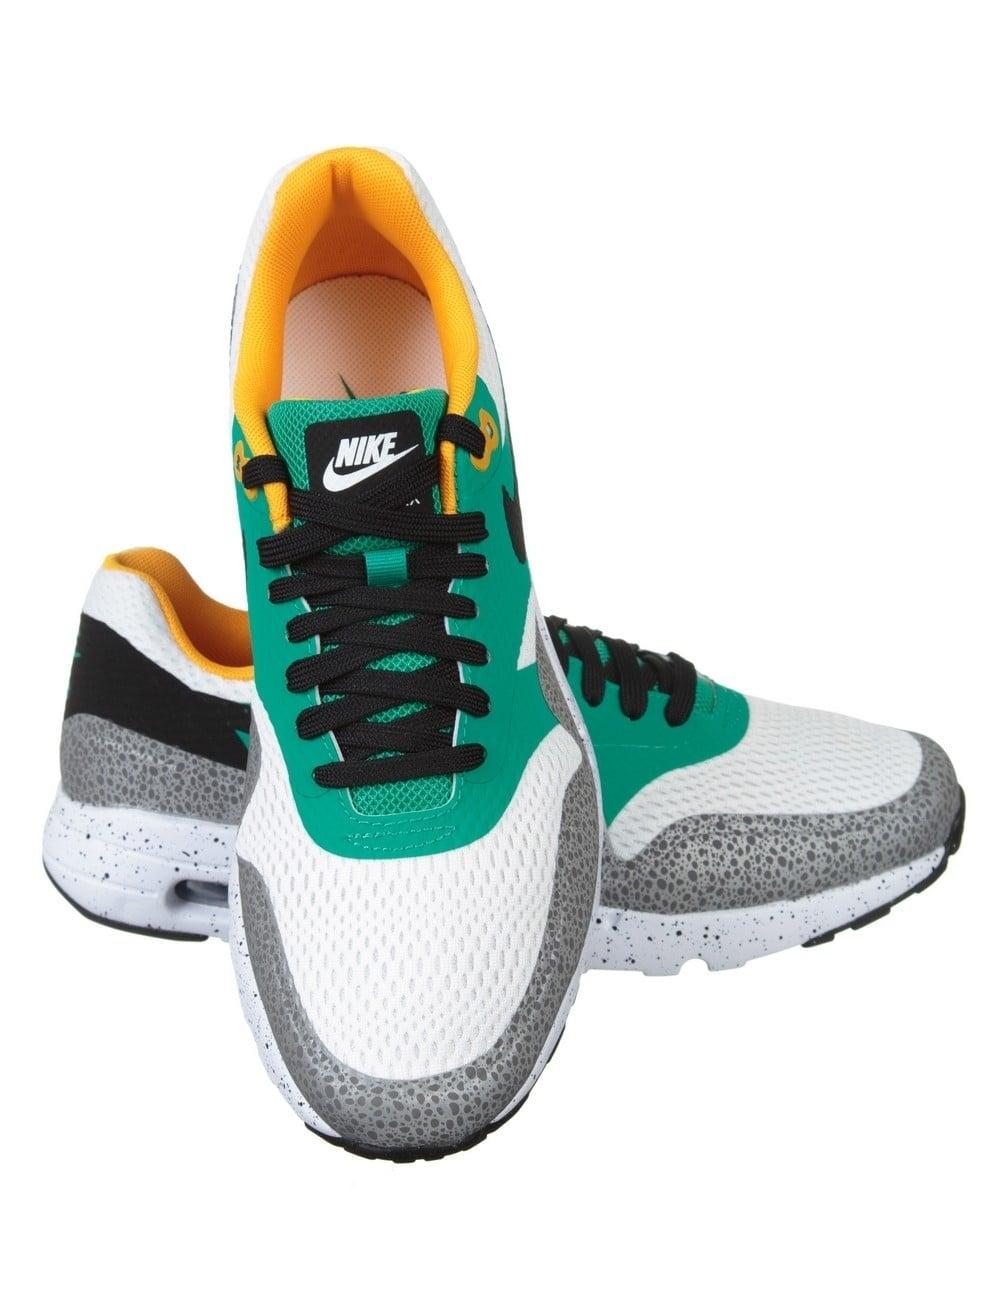 Nike Air Max 1 Ultra Essential White, Black, Emerald Green